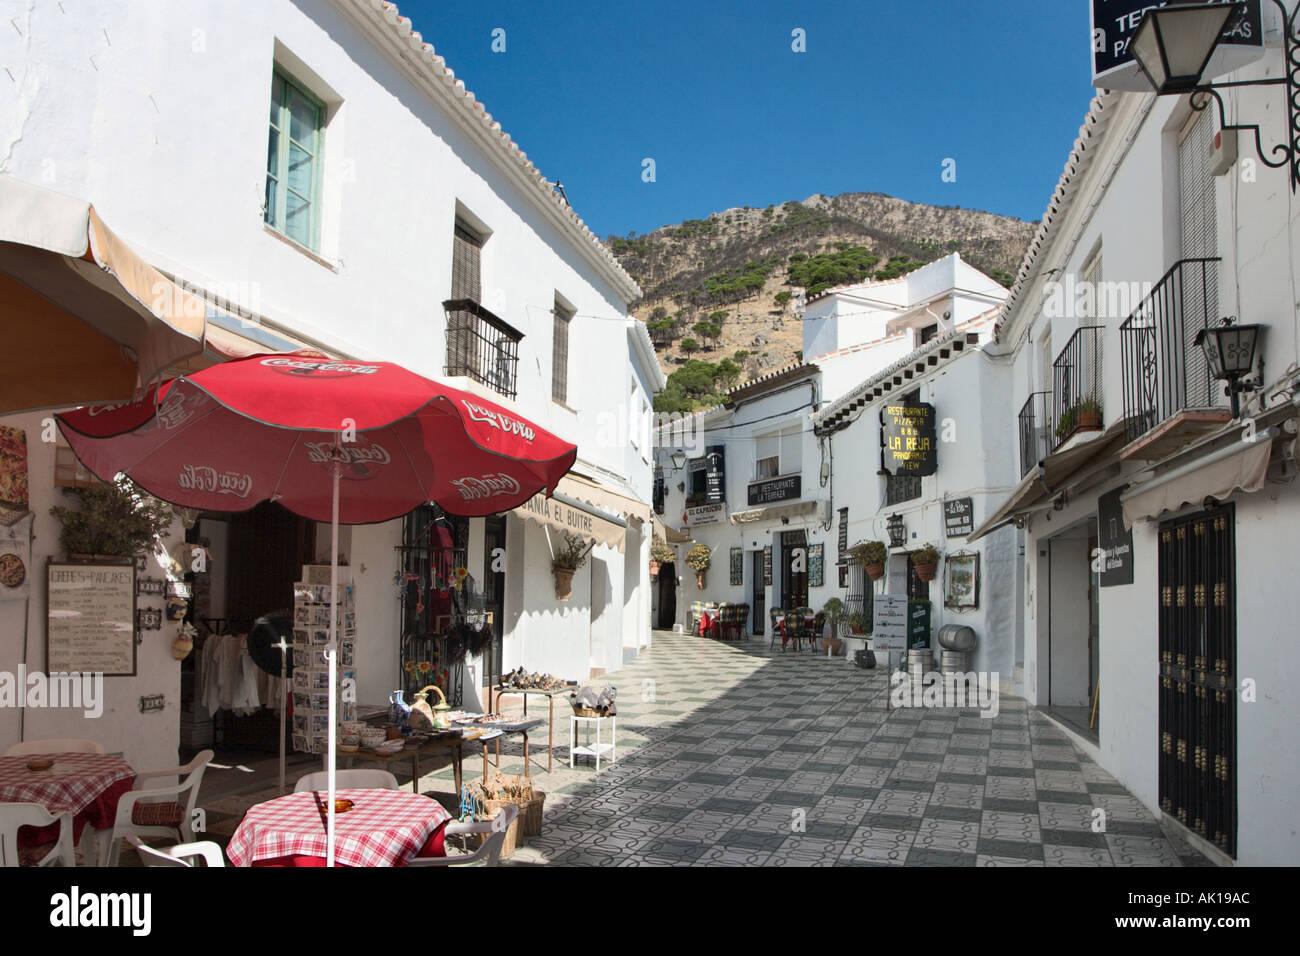 Calahonda Restaurants And Bars